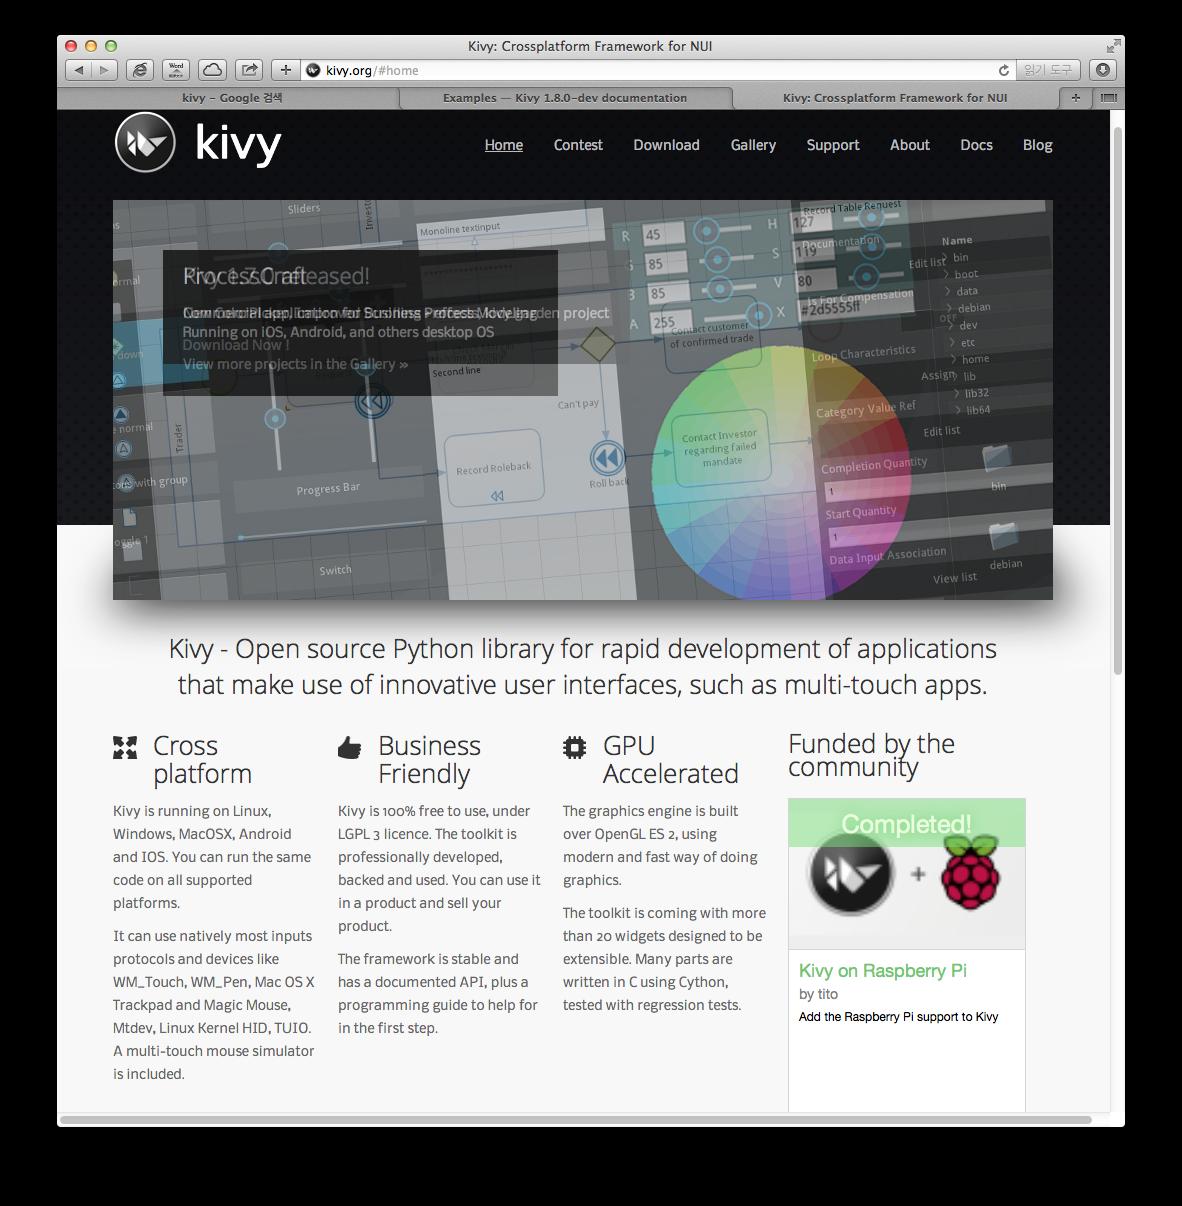 [OSX] Kivy 라는 파이썬 NUI 개발 환경